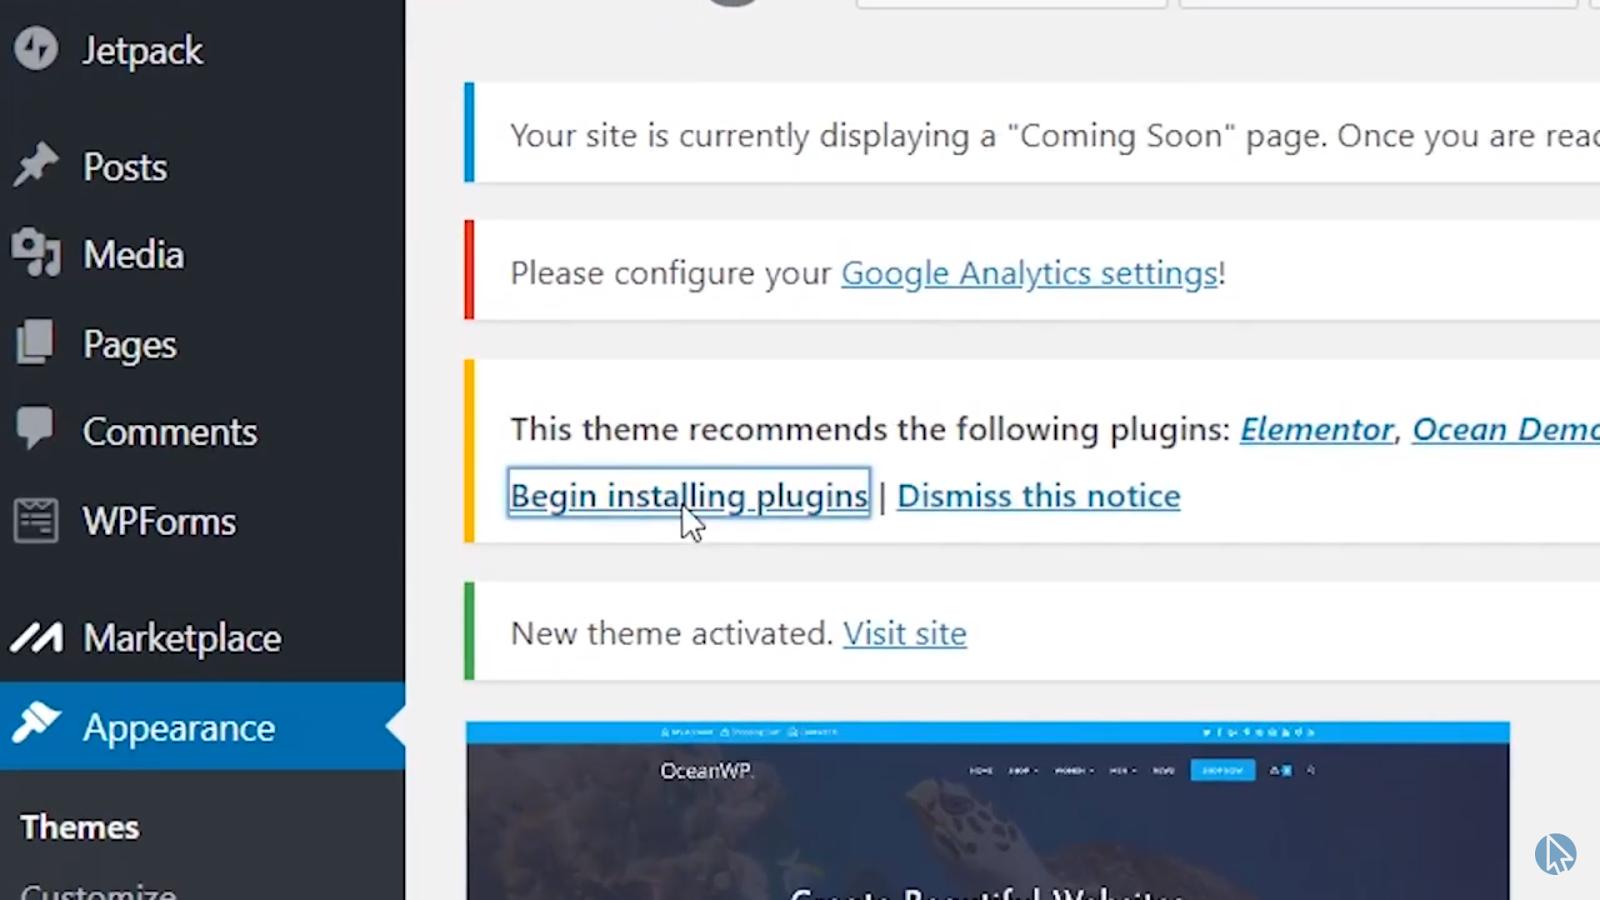 Begin installing plugins